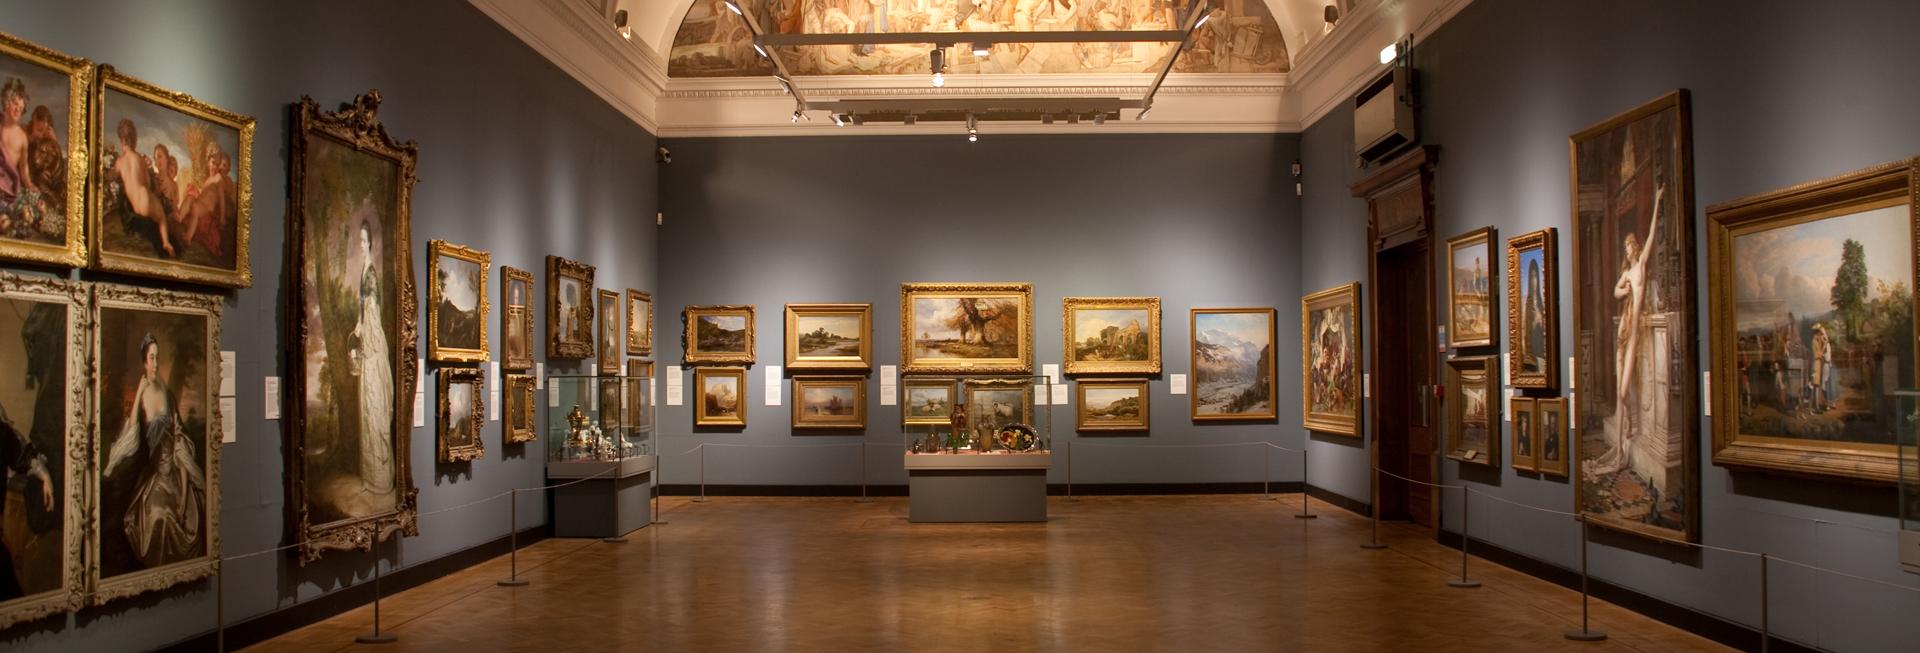 Laing Art Gallery, Newcastle-Upon-Tyne